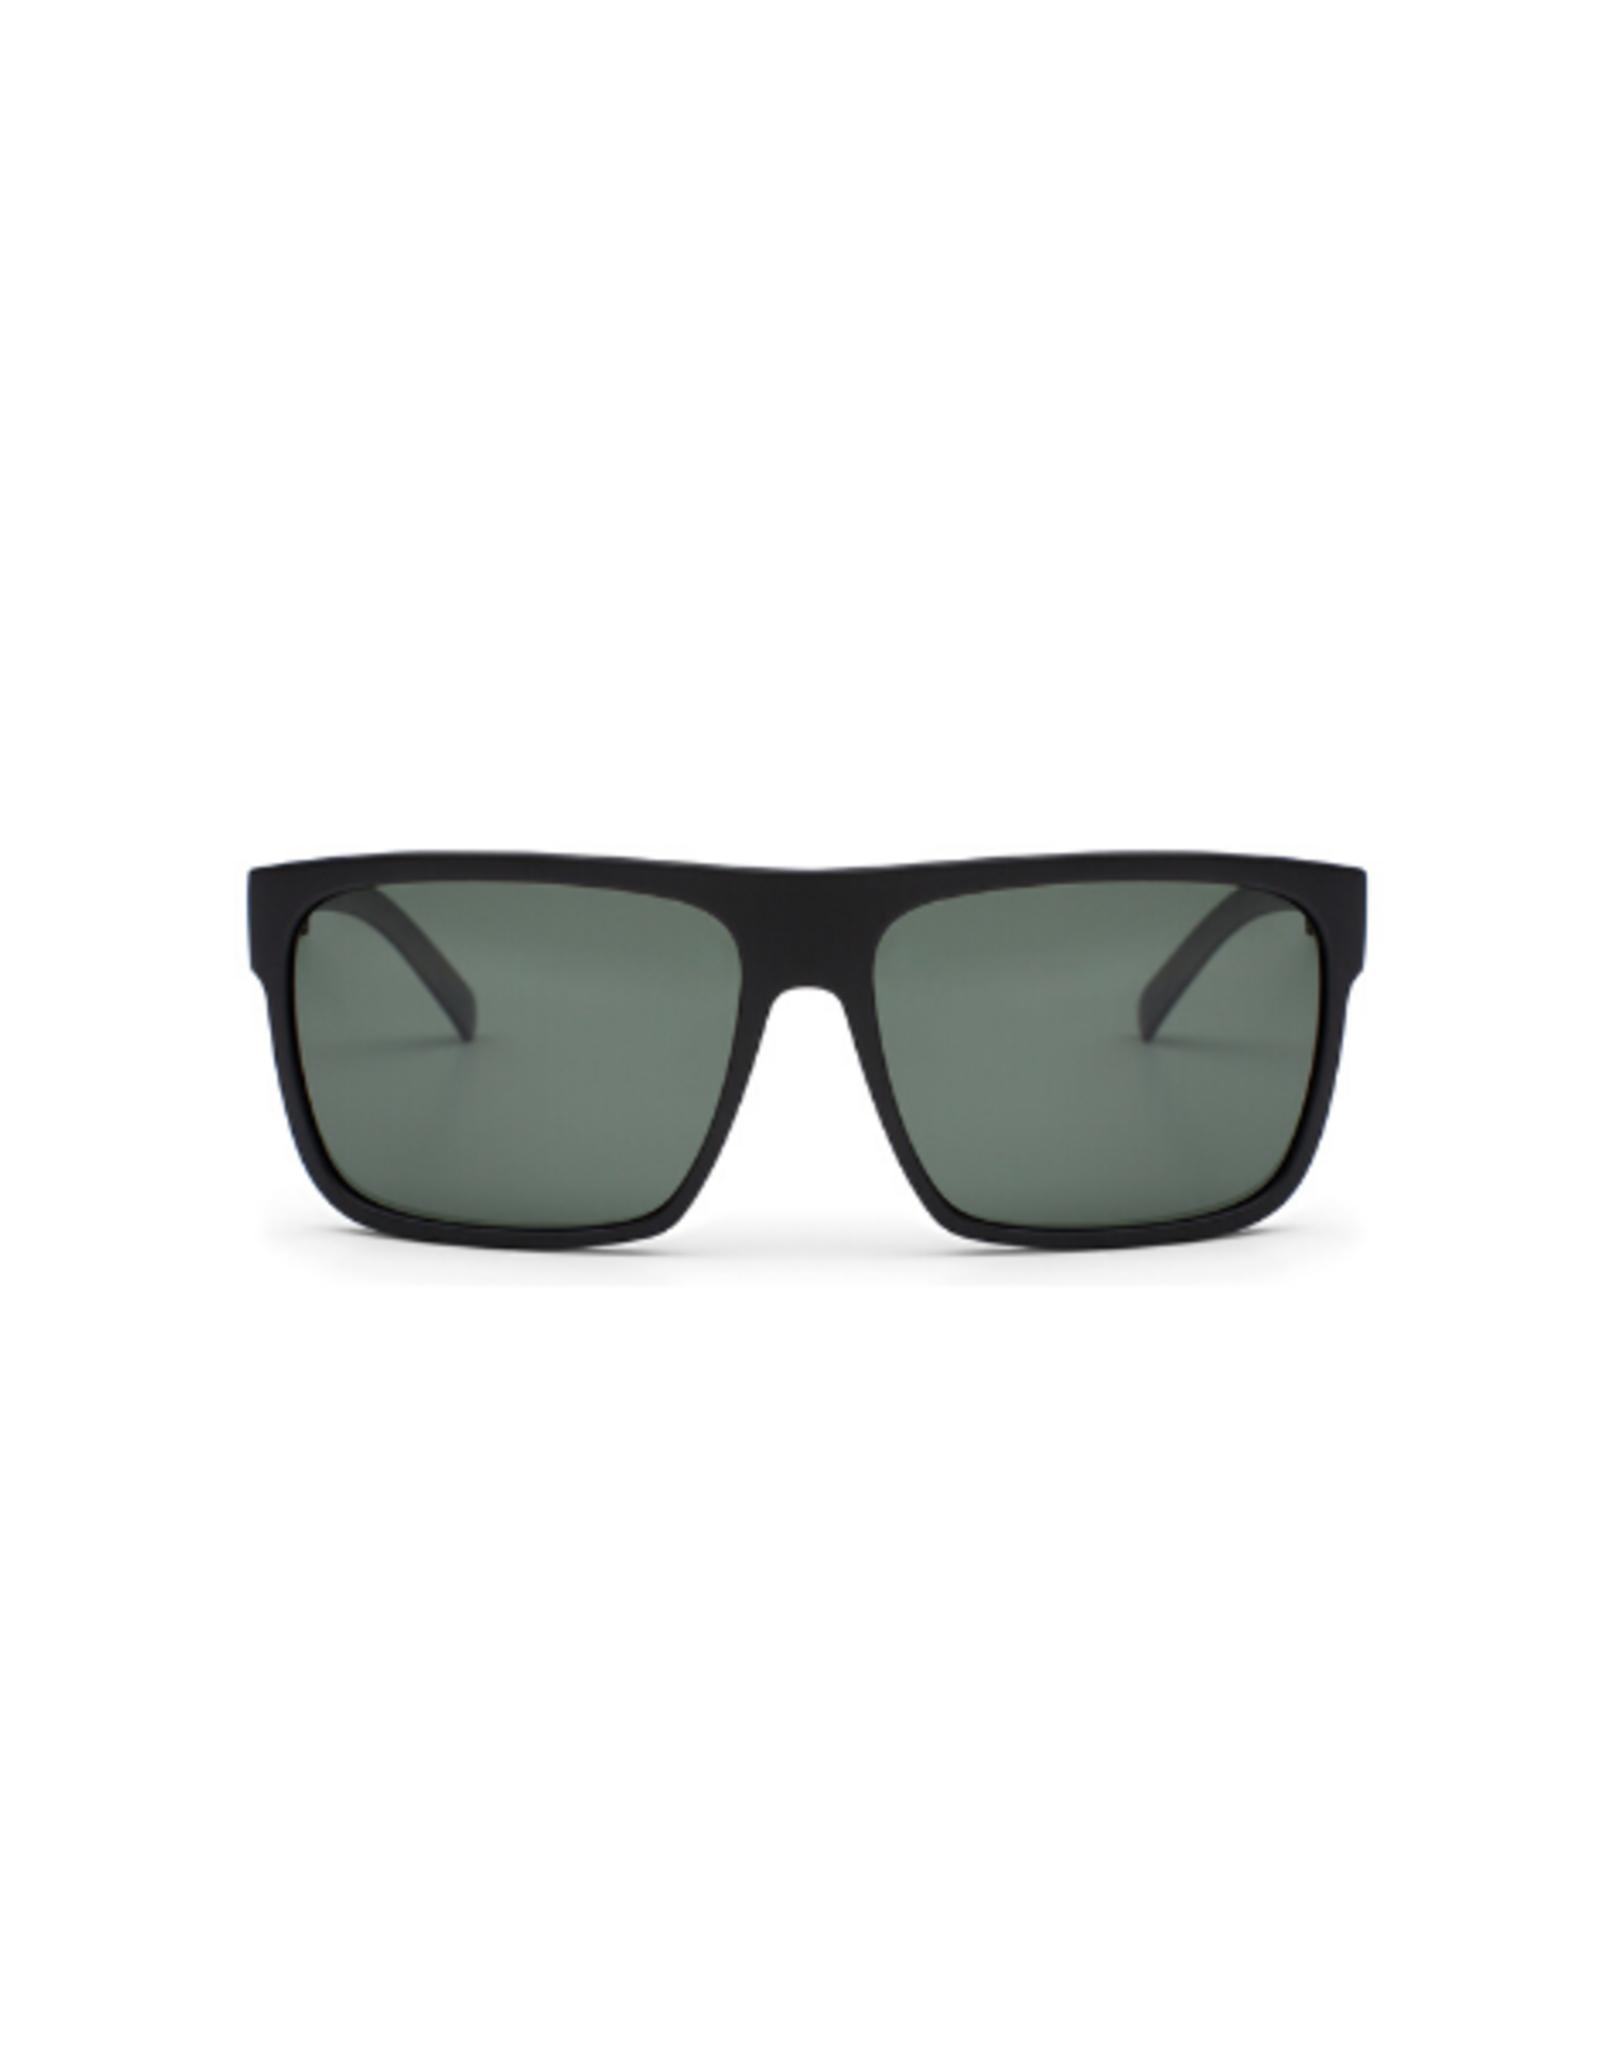 Otis Eyewear 15-1804LL After Dark Matte BLK/LIT Polar Grey